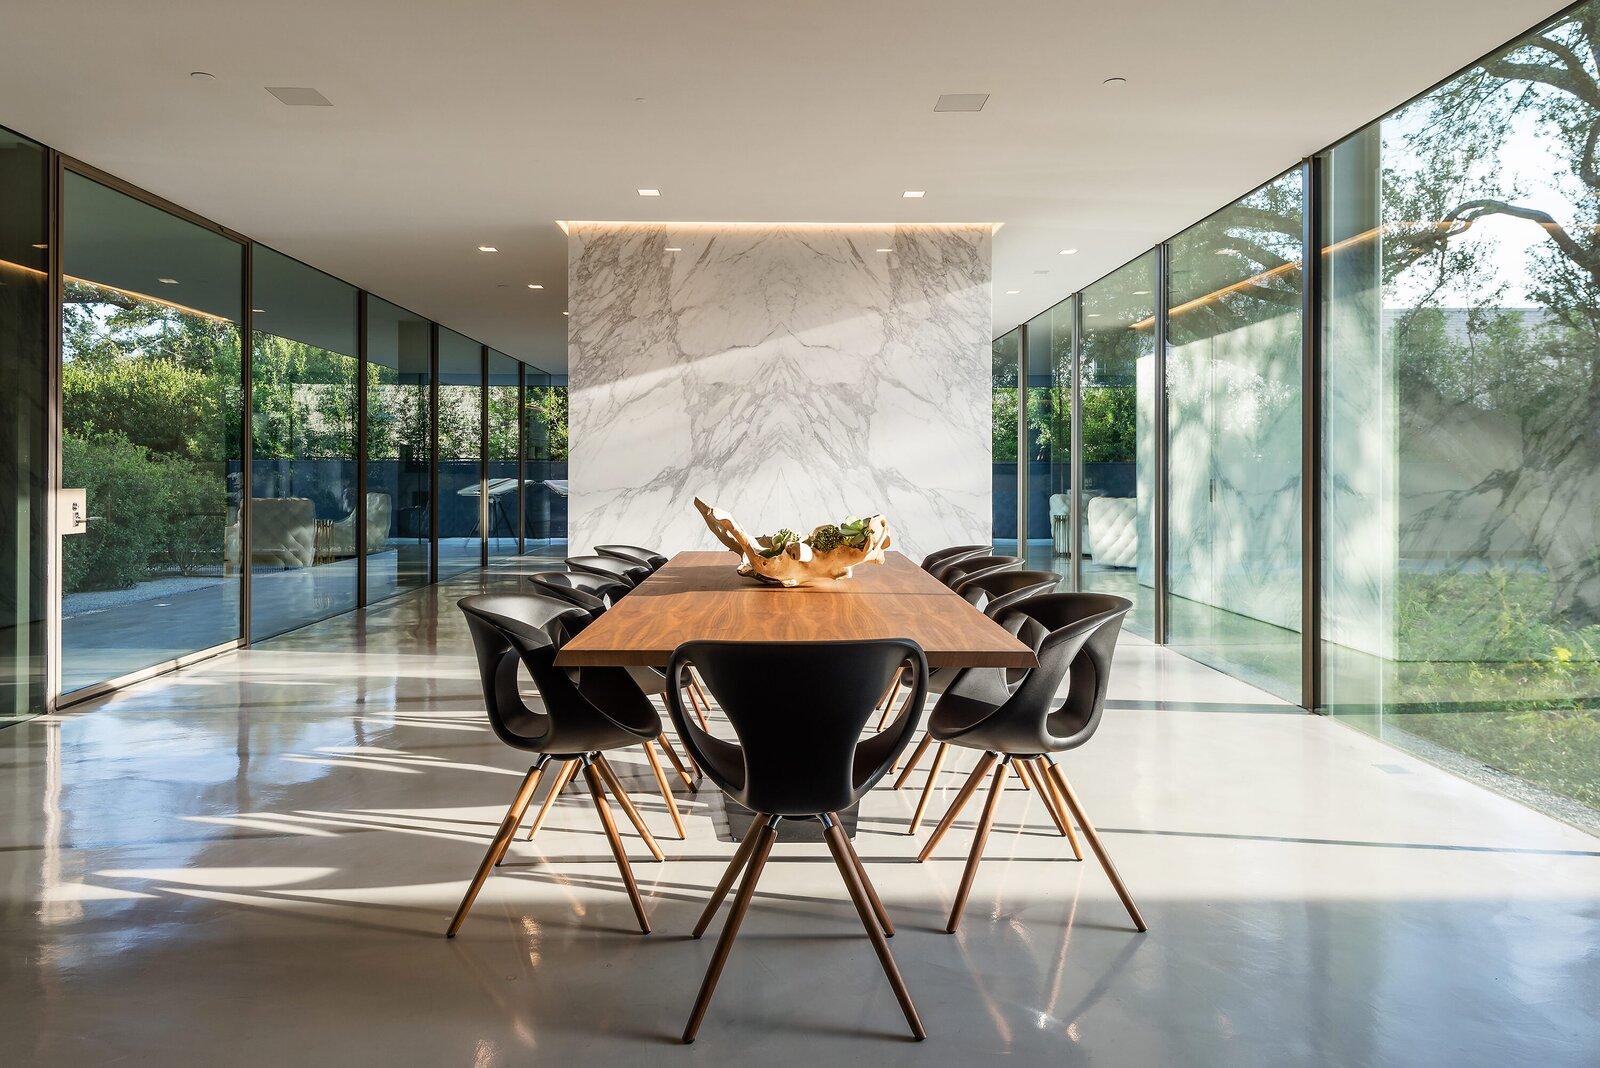 Photo 3 of 10 in A Farnsworth-Inspired Contemporary Home in Dallas Asks $7.9M